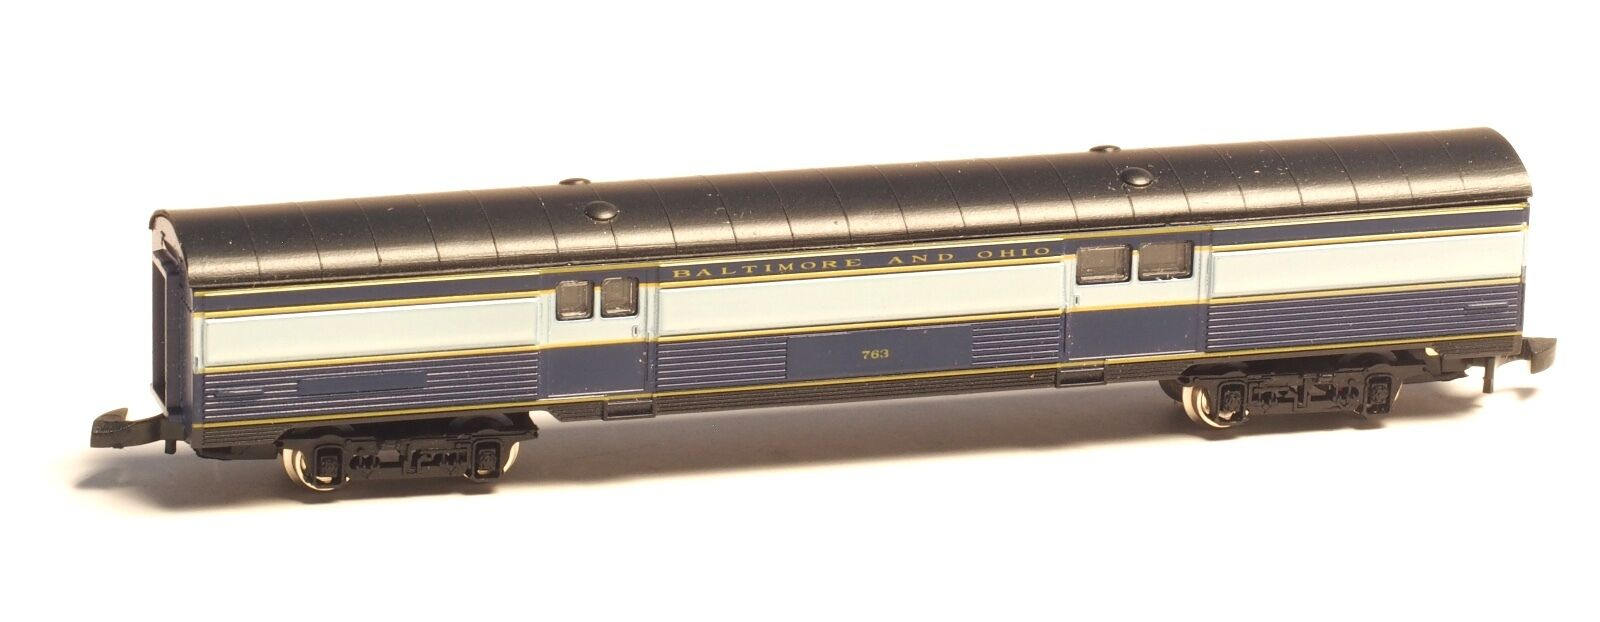 Marklin Z-scale Baltimore & Ohio B&O USA Borsagage Passenger Car with LED LIGHT